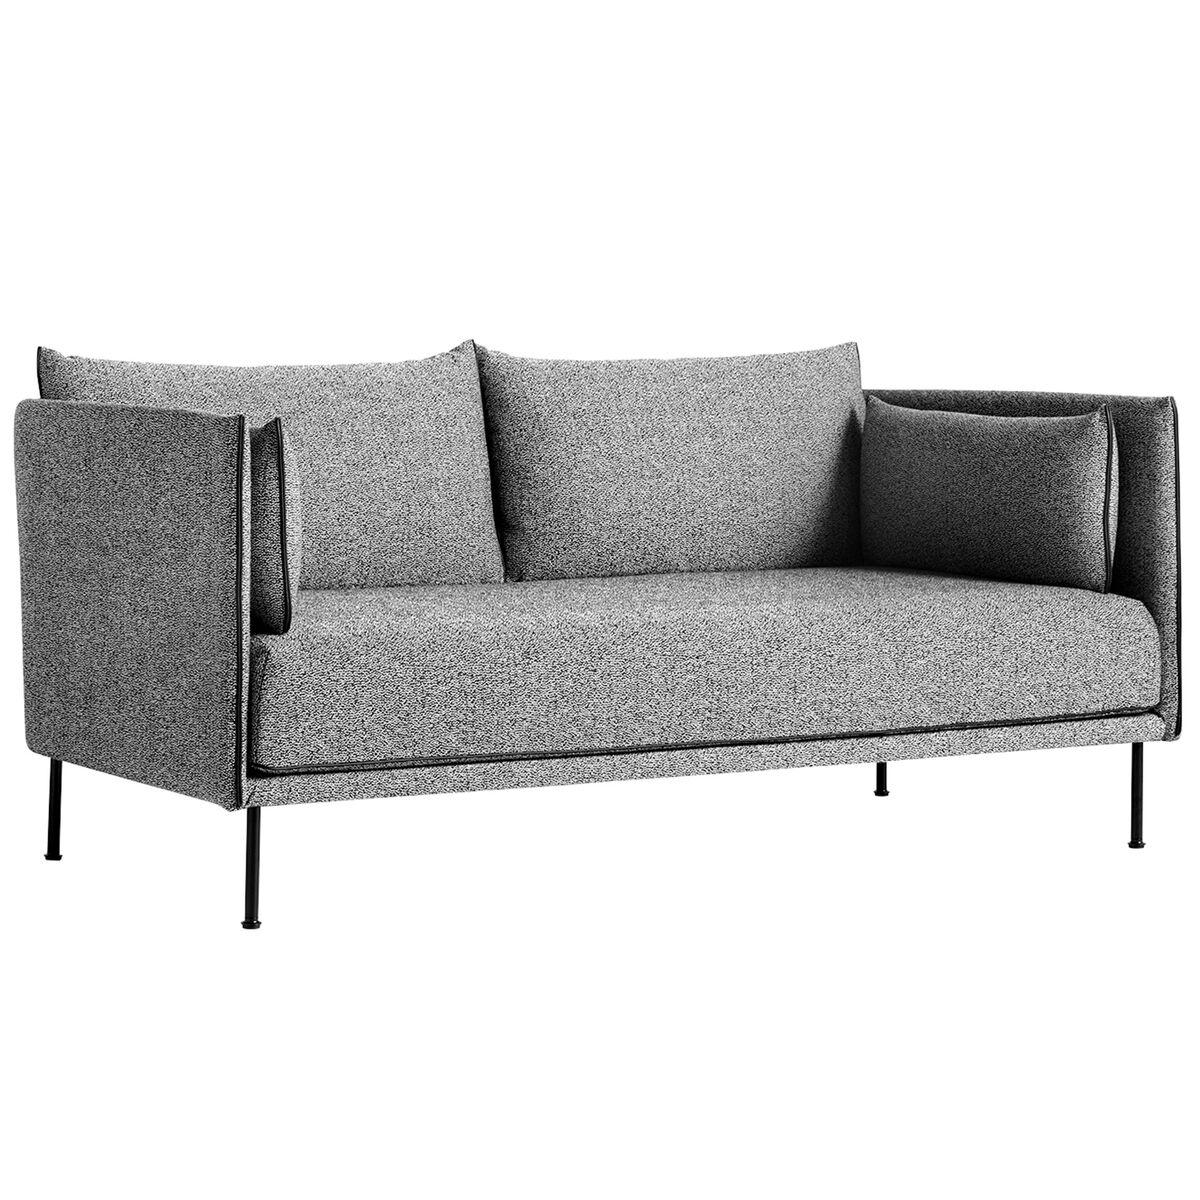 Hay Silhouette sohva 2-ist,  Olavi 03/Silk black - musta ter�s